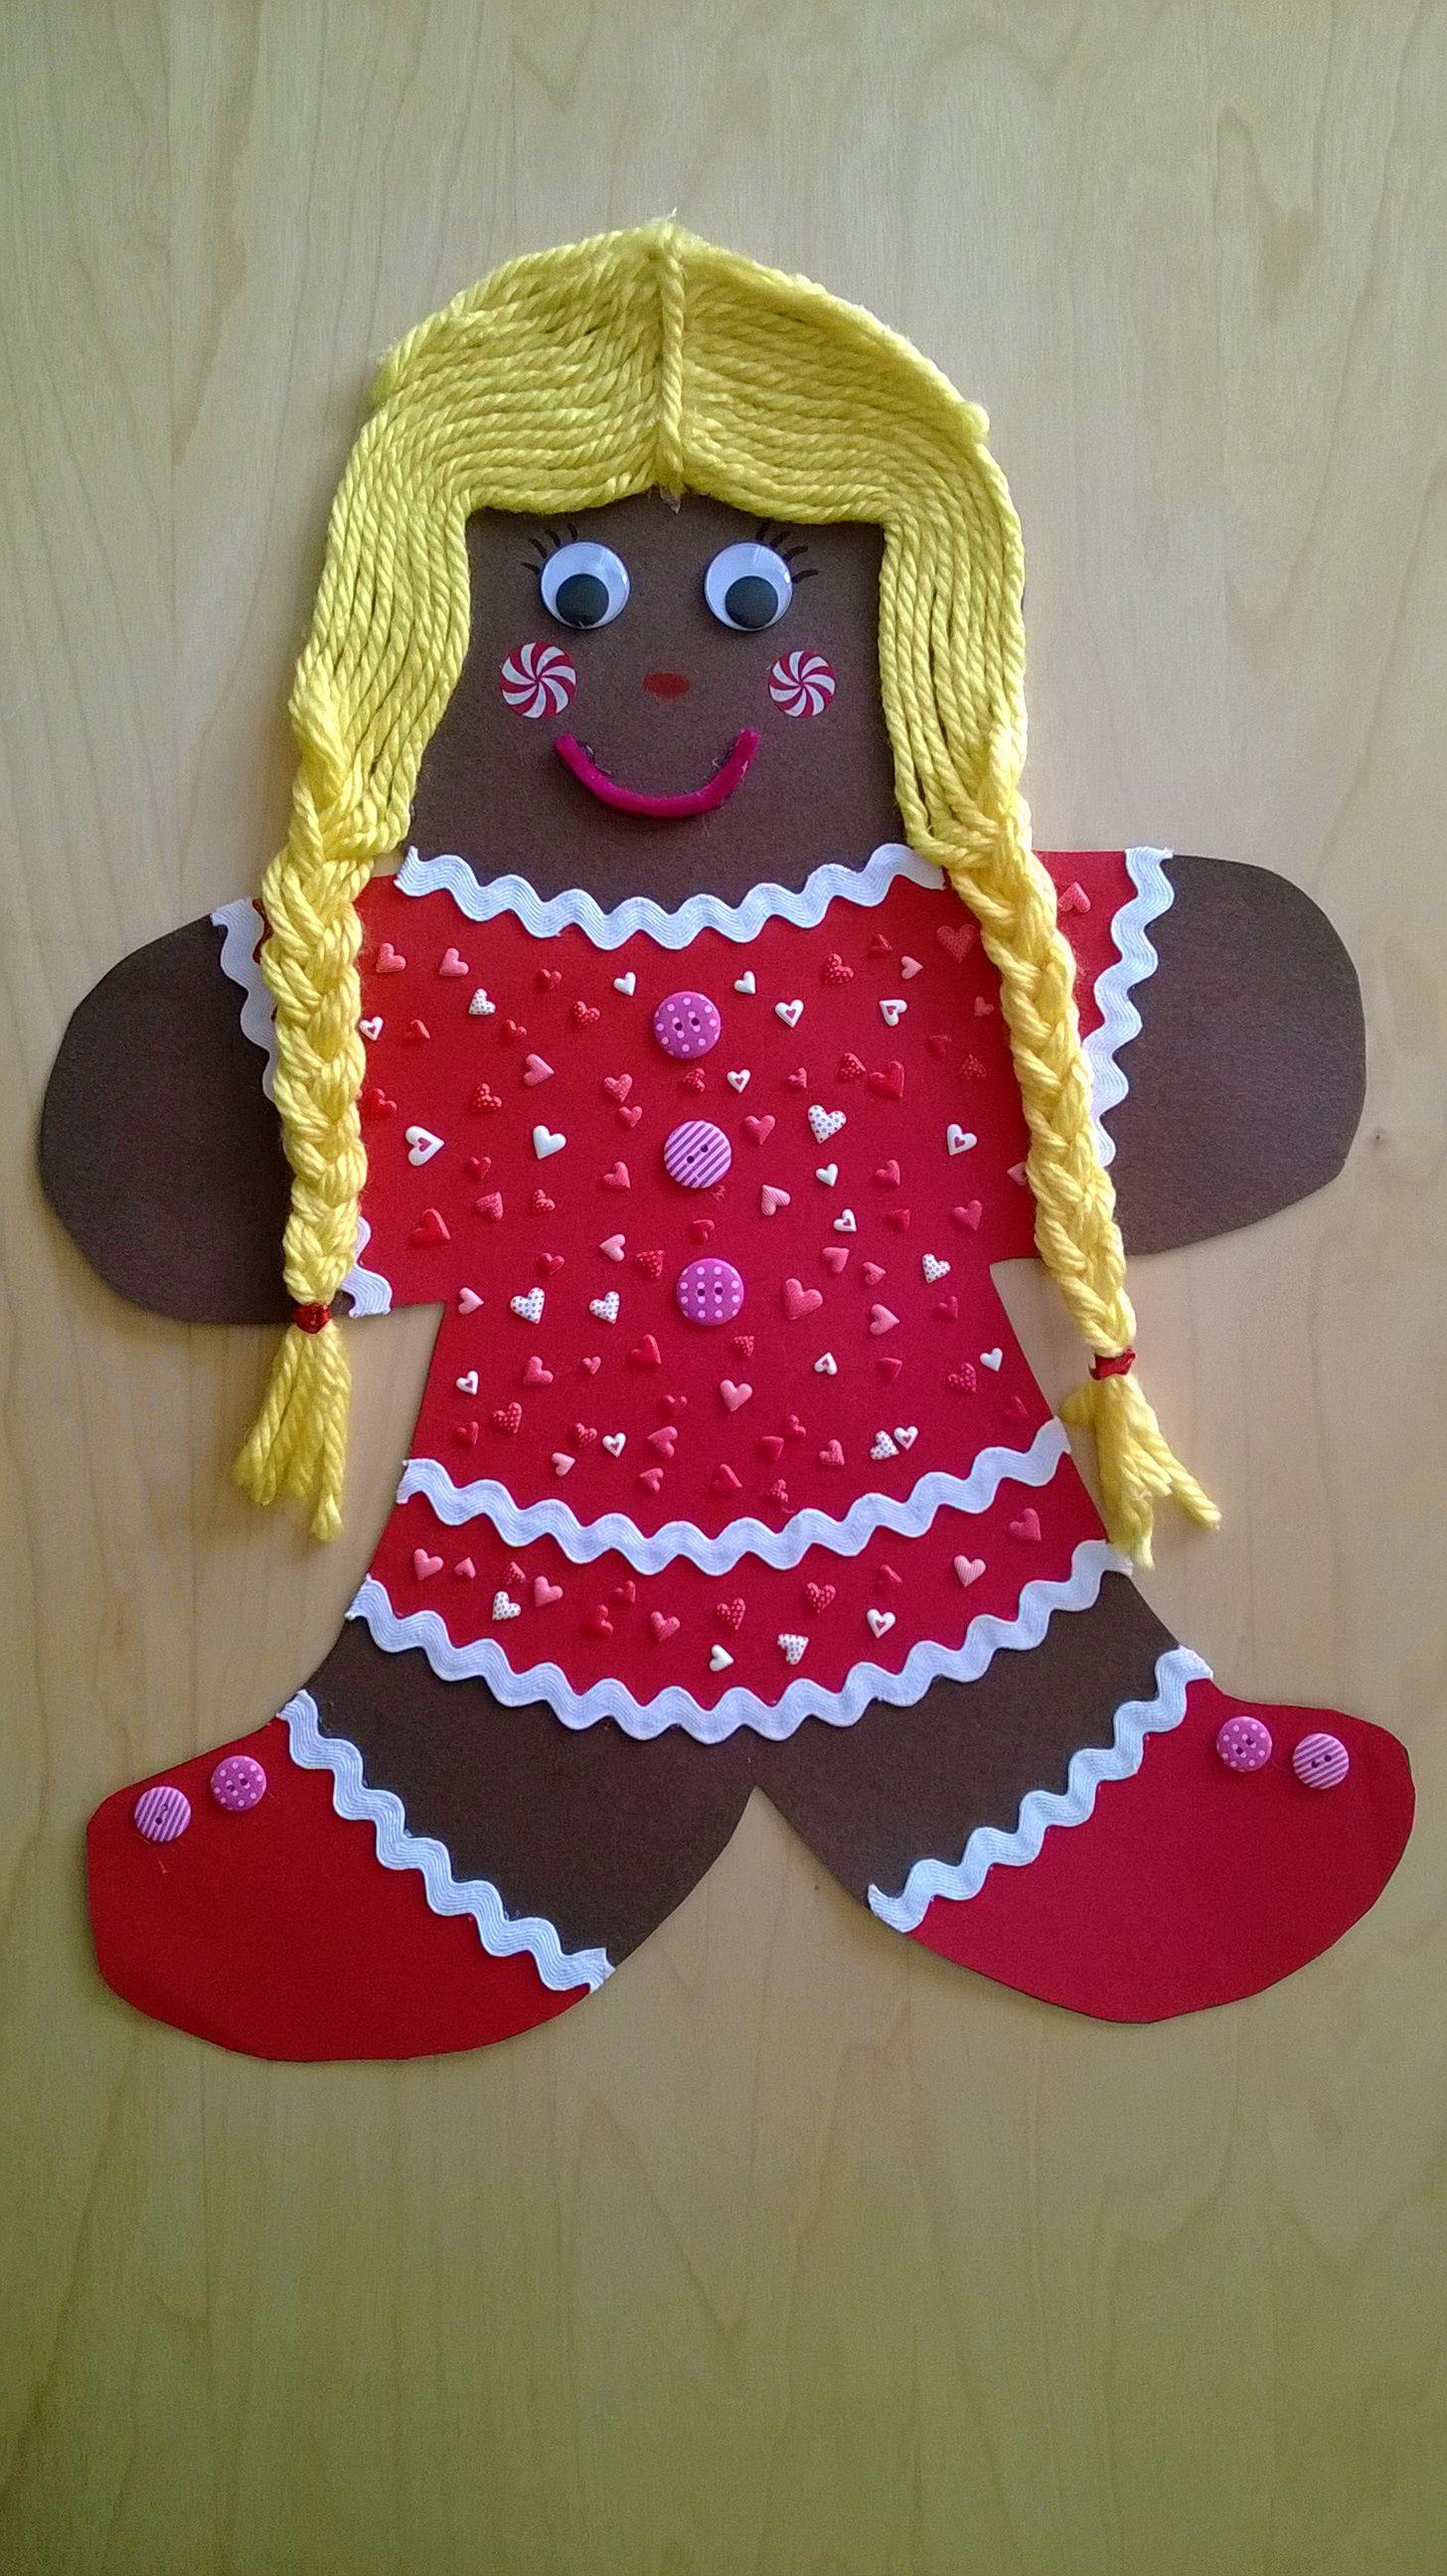 Suzy Gingerbread Man S Girlfriend Preschool Homework Project For